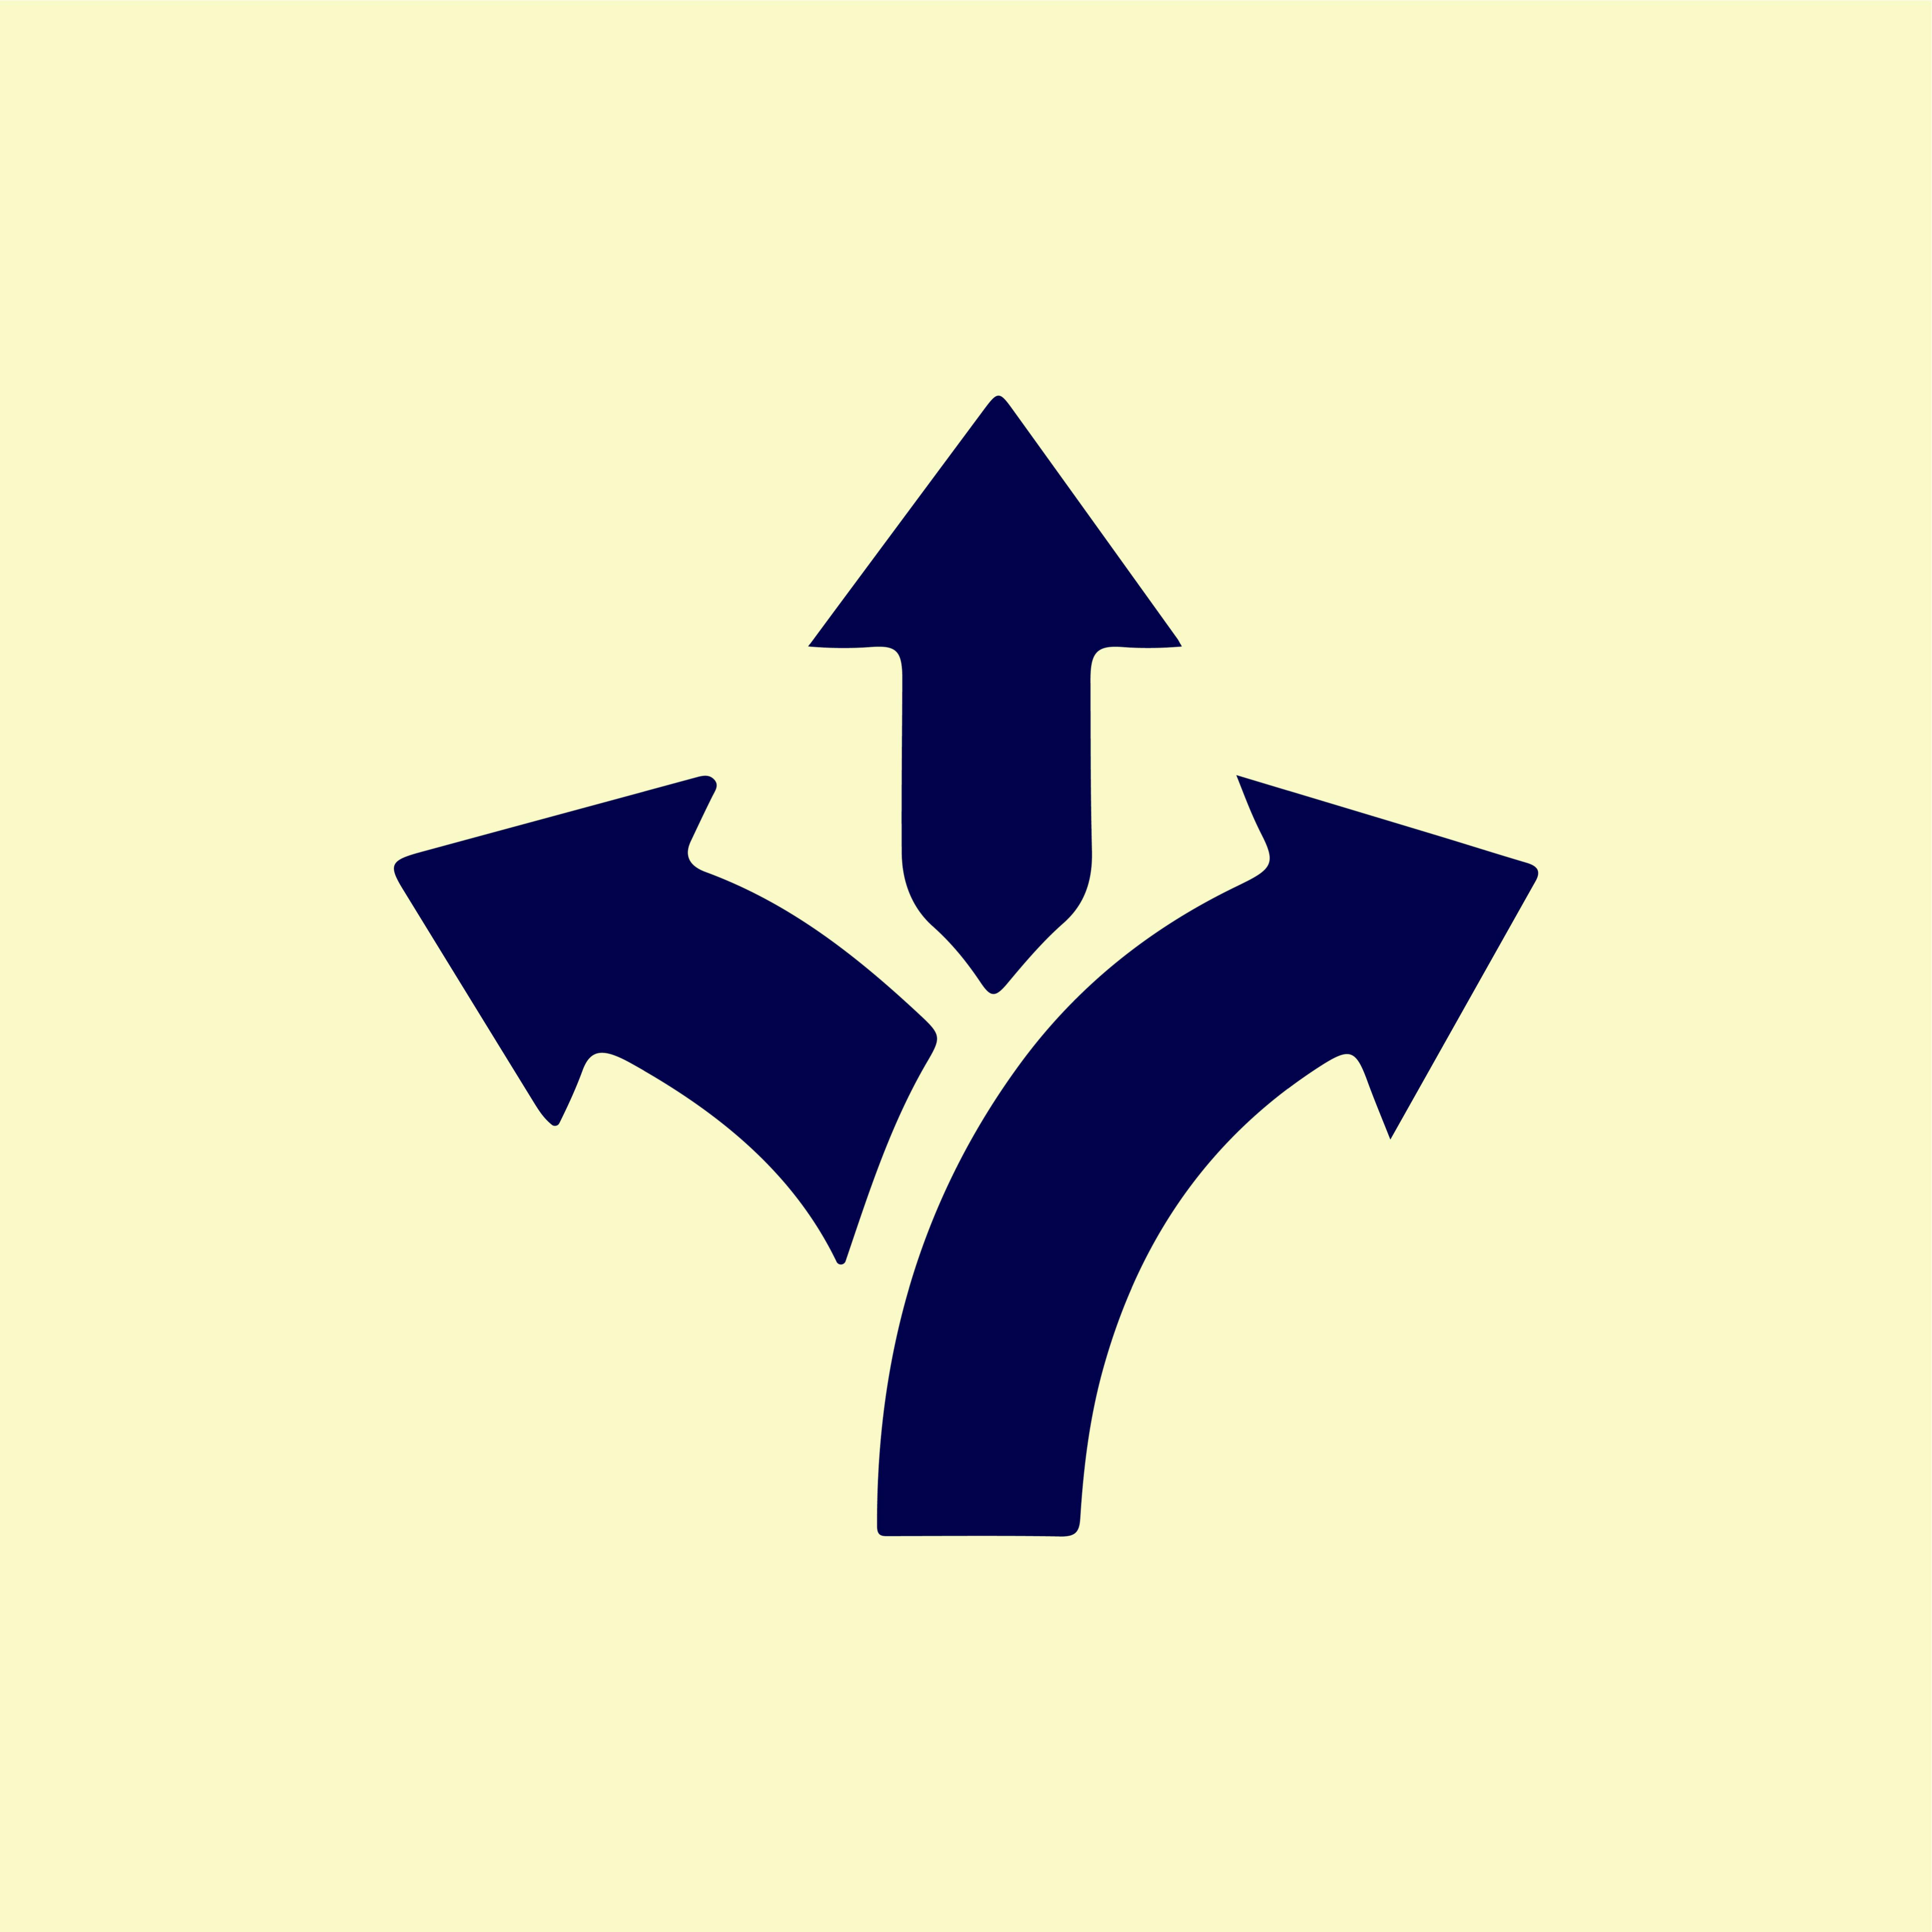 Drive - Decisions